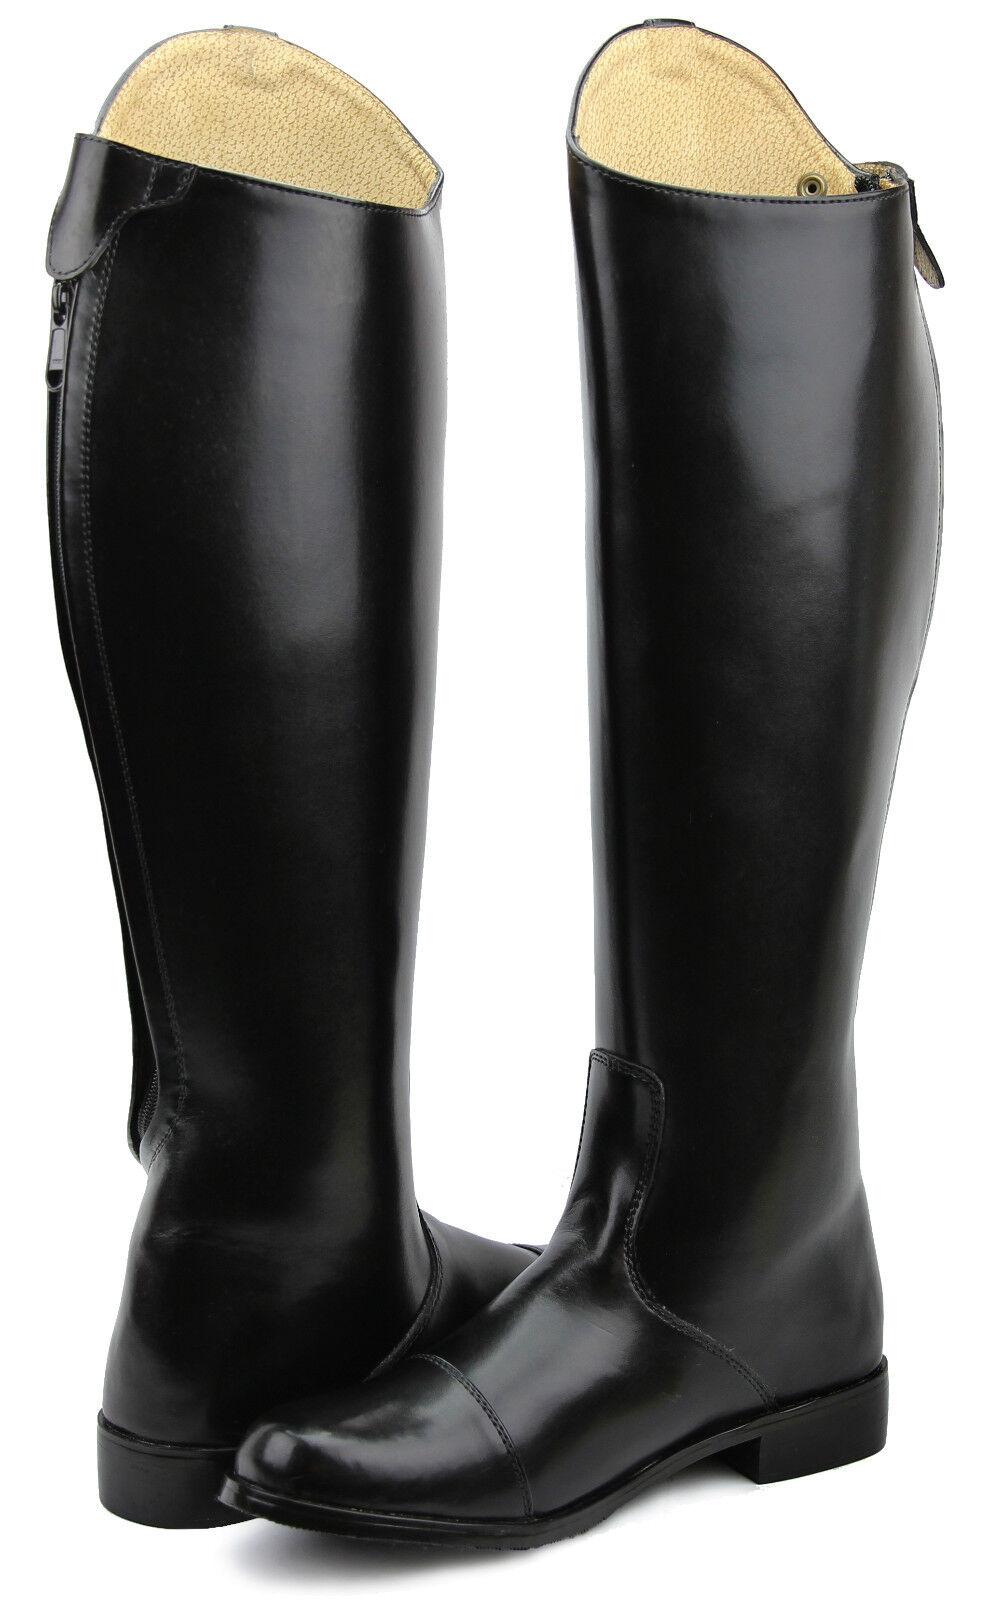 Hispar Ladies  STIRLING Dress Dressage Boots With Zipper English Horse Riding  official website